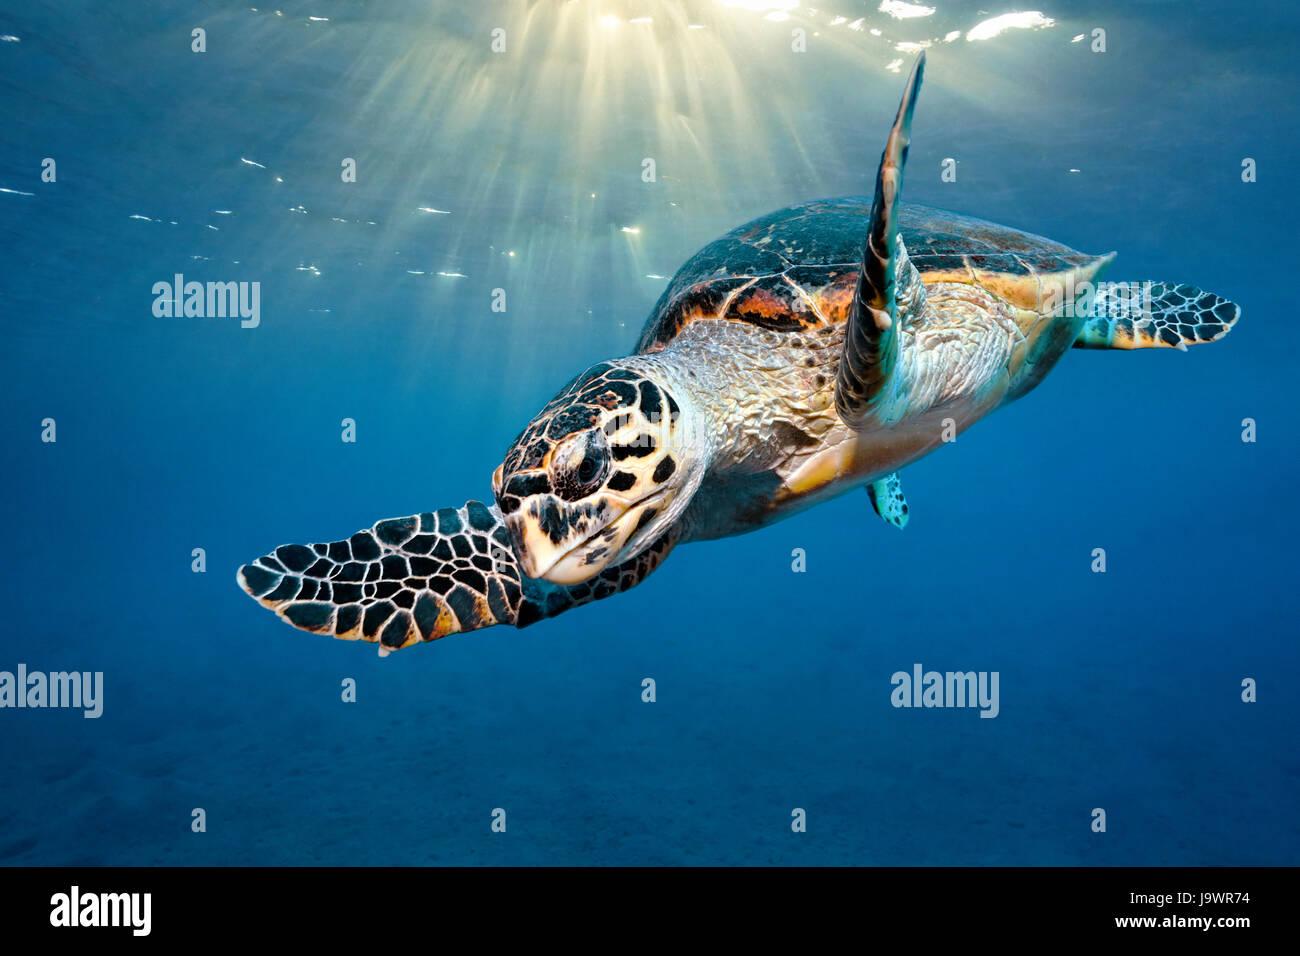 Loggerhead sea turtle (Caretta Caretta), sunlight under the ocean surface, Red Sea, Egypt Stock Photo